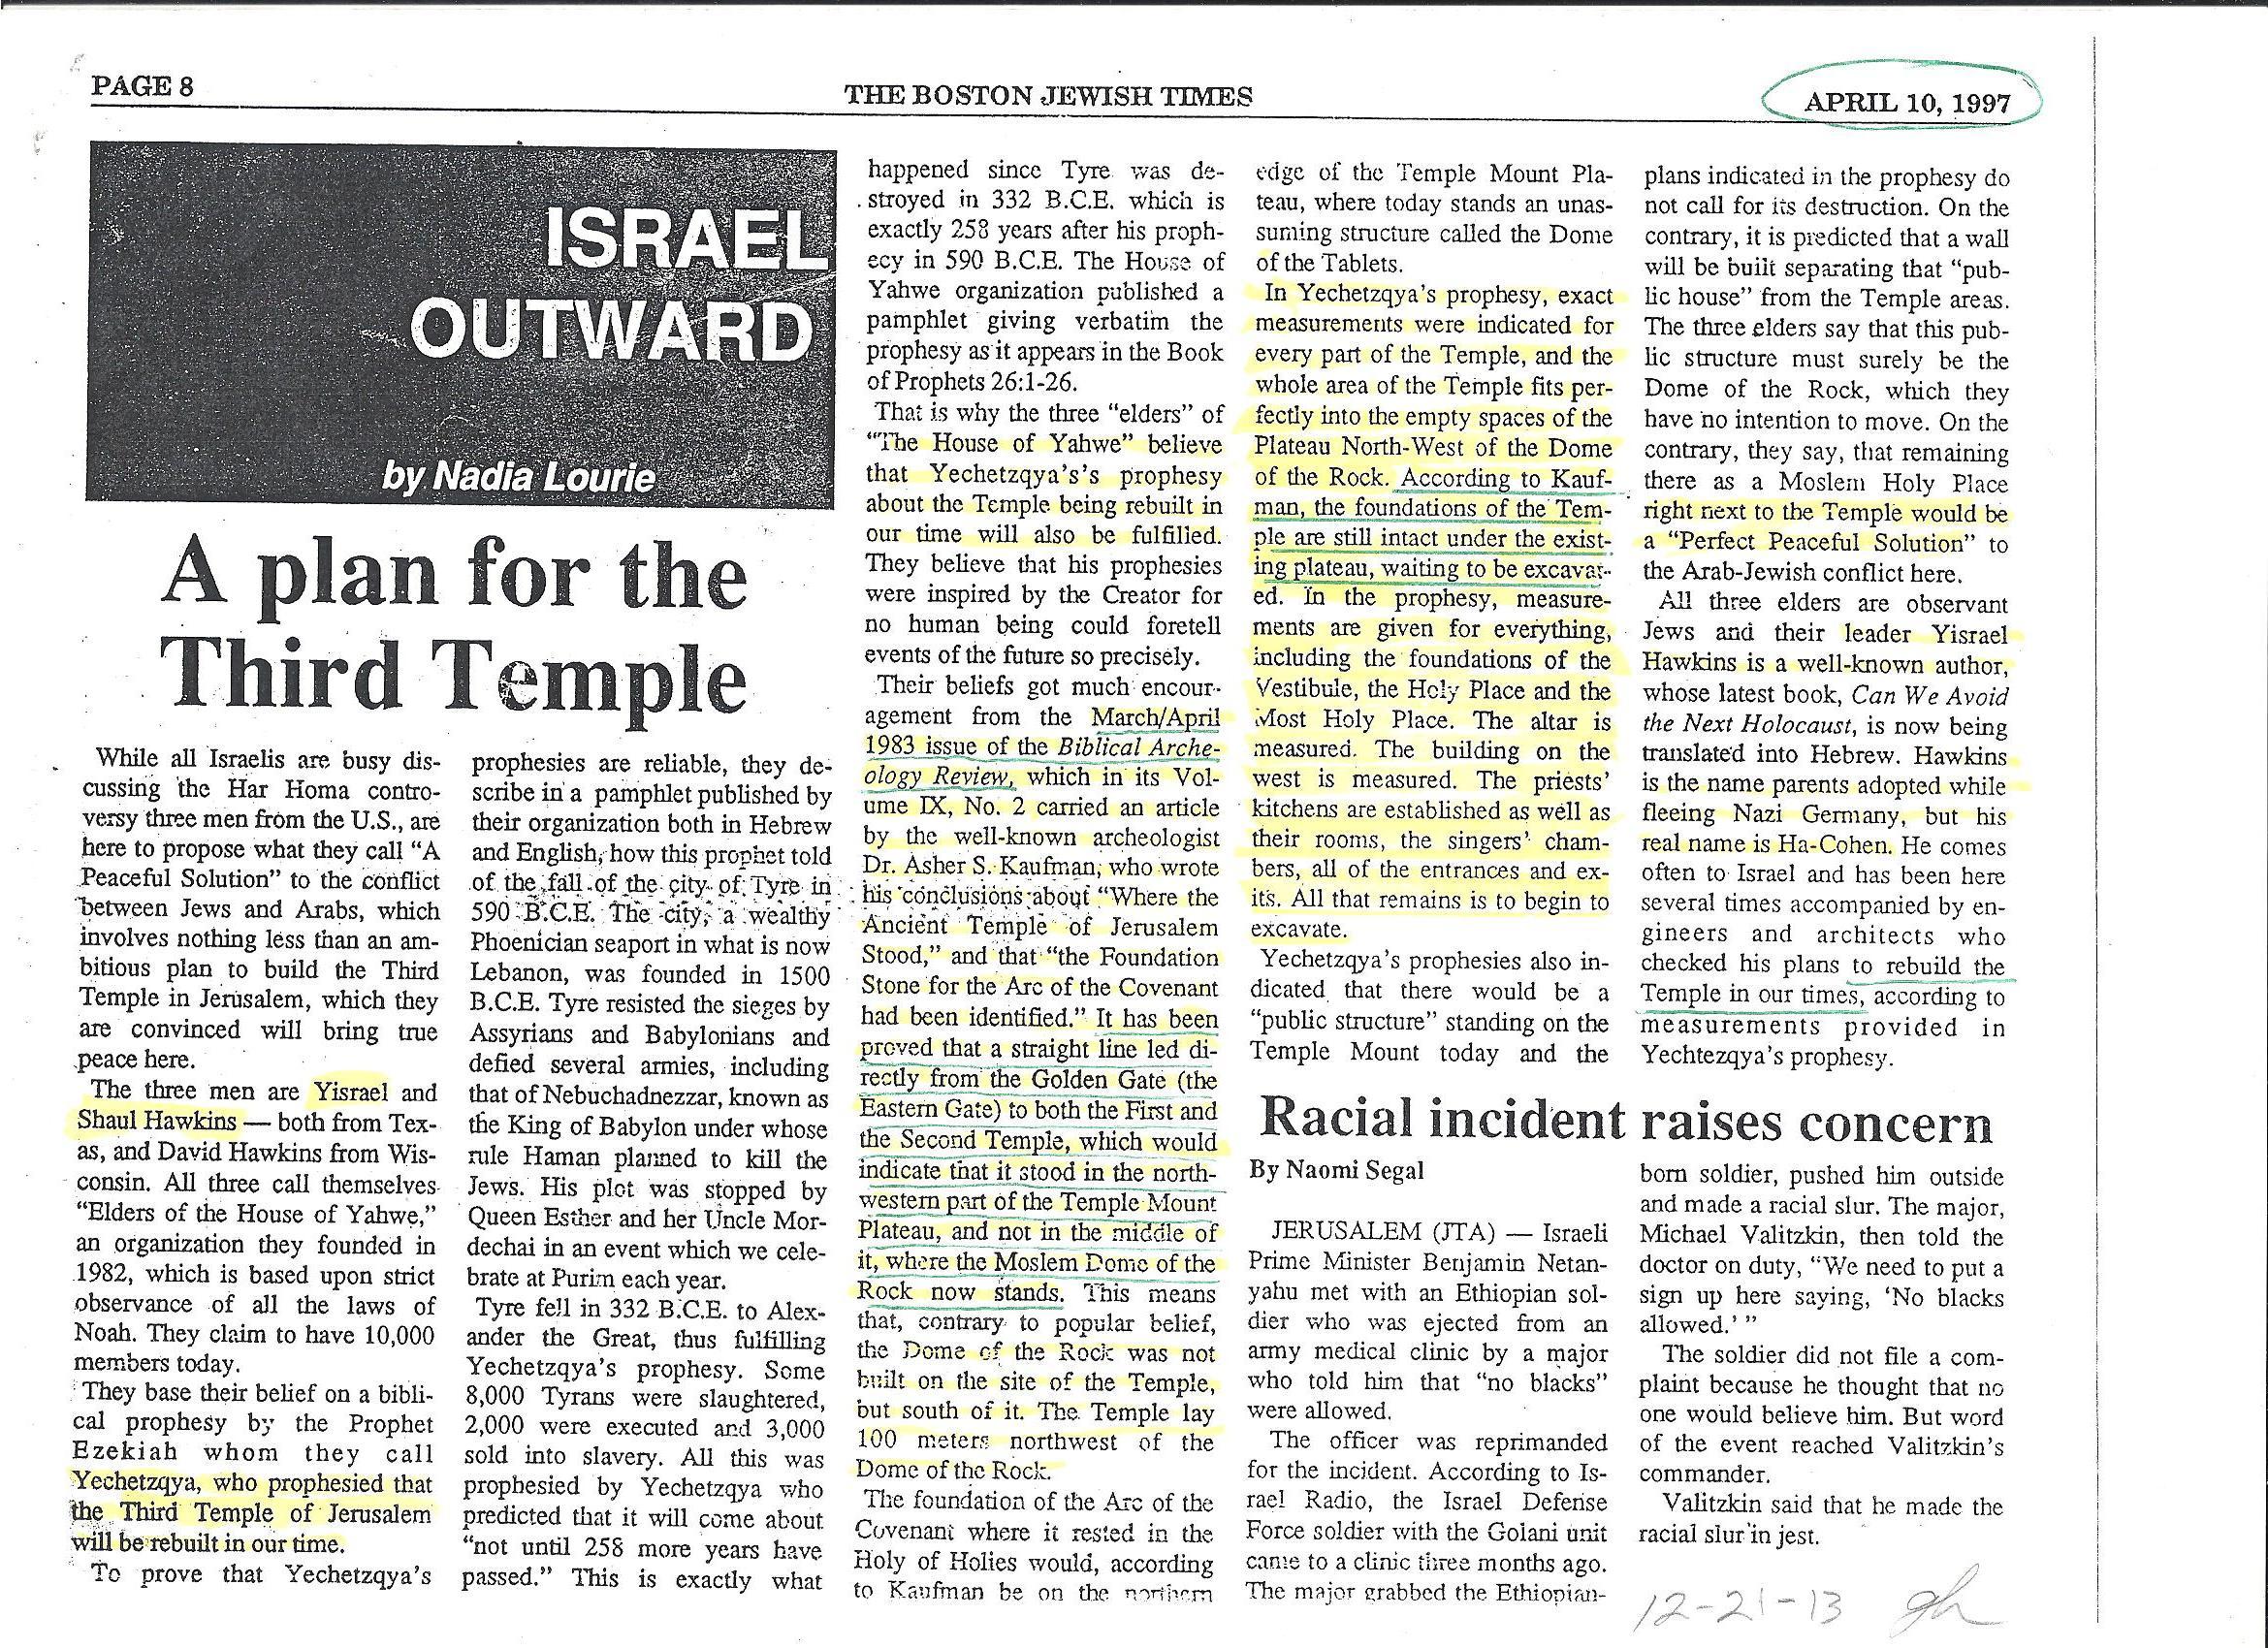 Boston Jewish Times